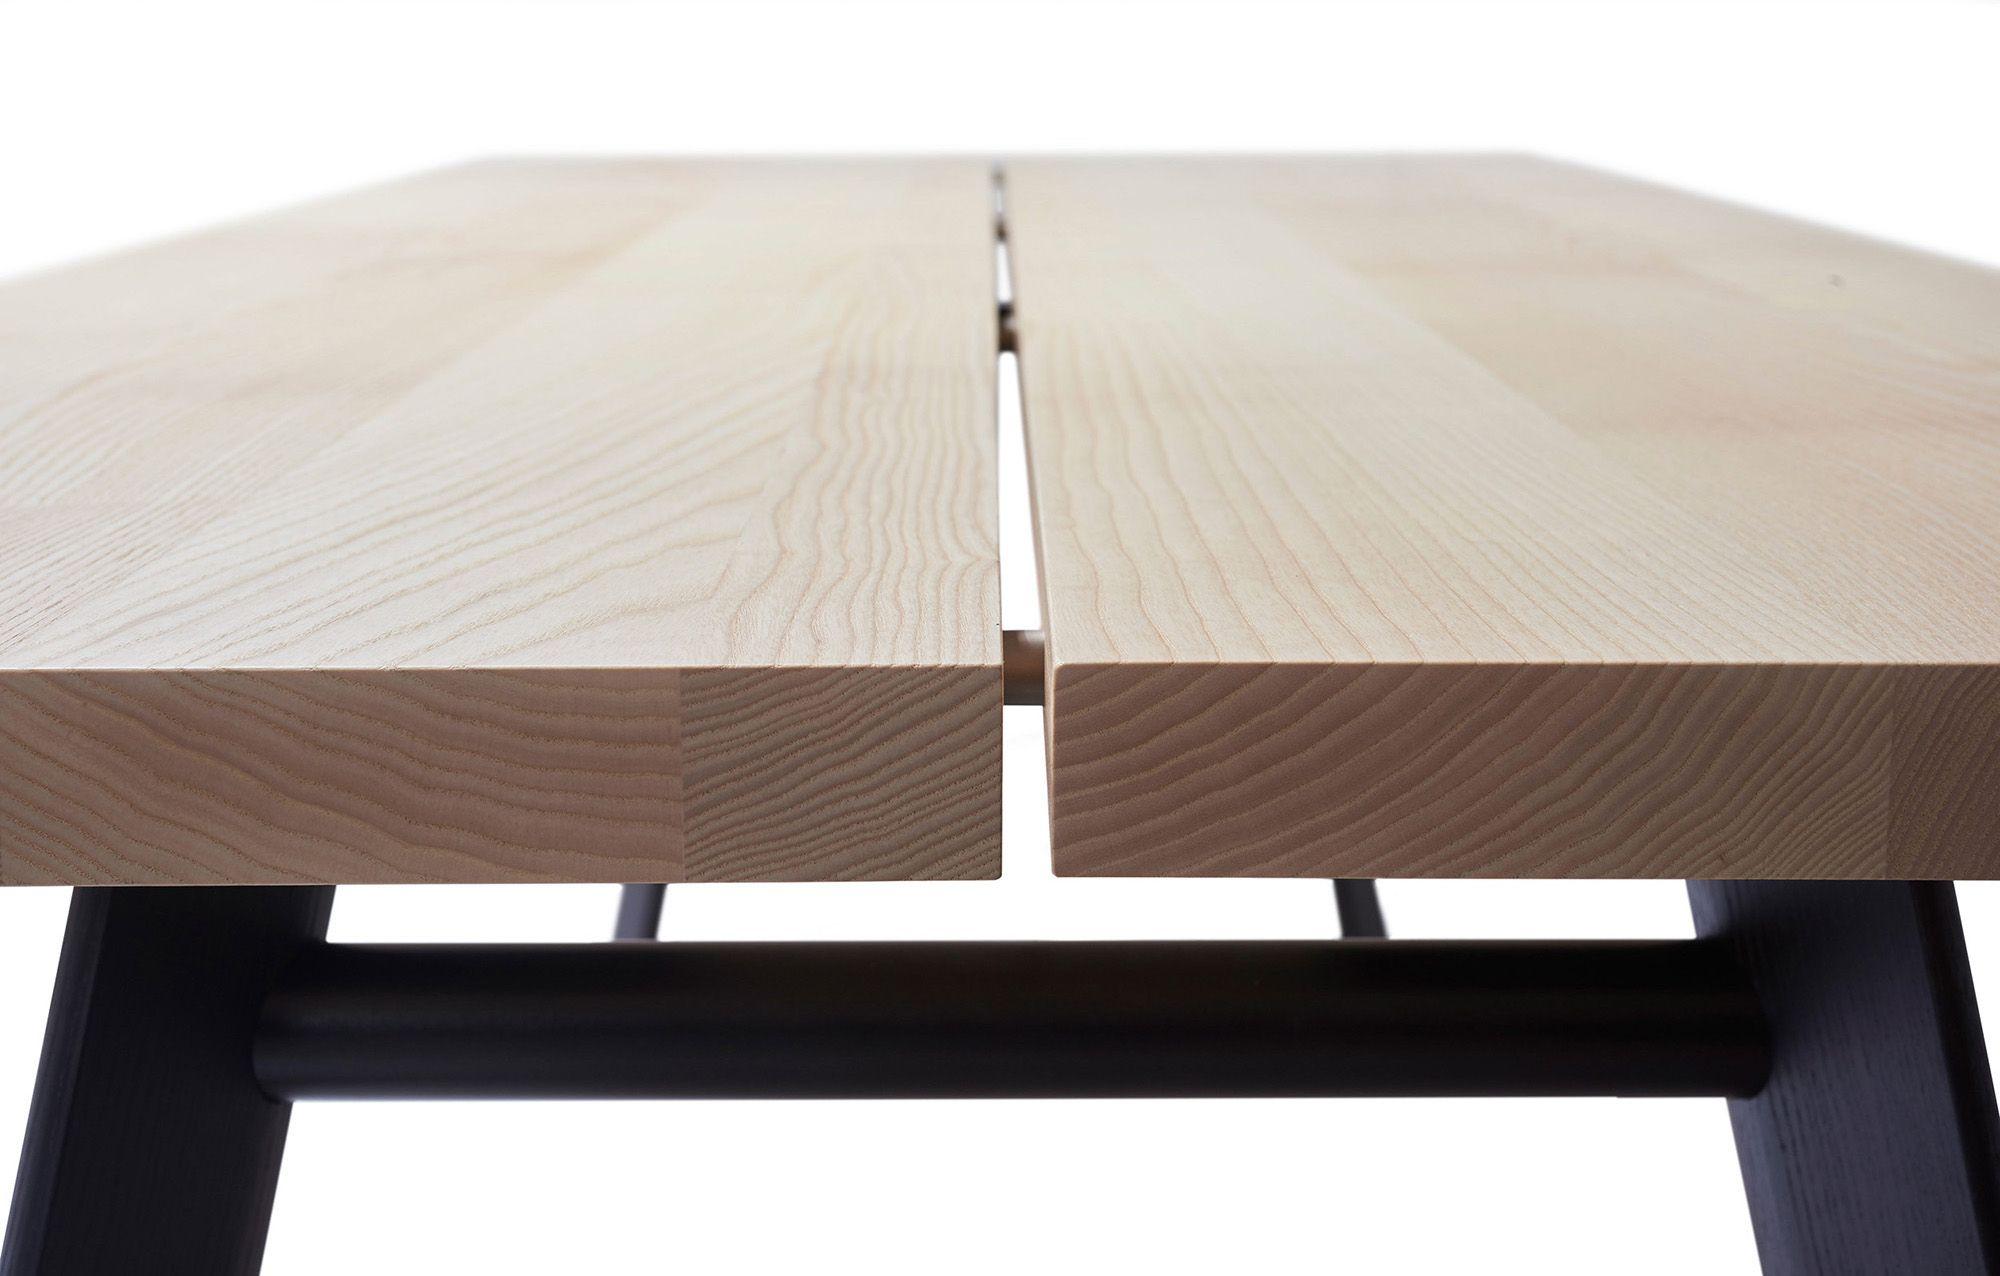 P68 table. Presented in white pigmented ash, legs made of black brushed ash, other wood types are possible. Design: Peter Fehrentz #massivholztisch, #massivholztische, #solidwoodtable, #solidwoodtables, #madeingermany, #esstisch, #esstische, #diningtable, #diningtables, #designermöbel